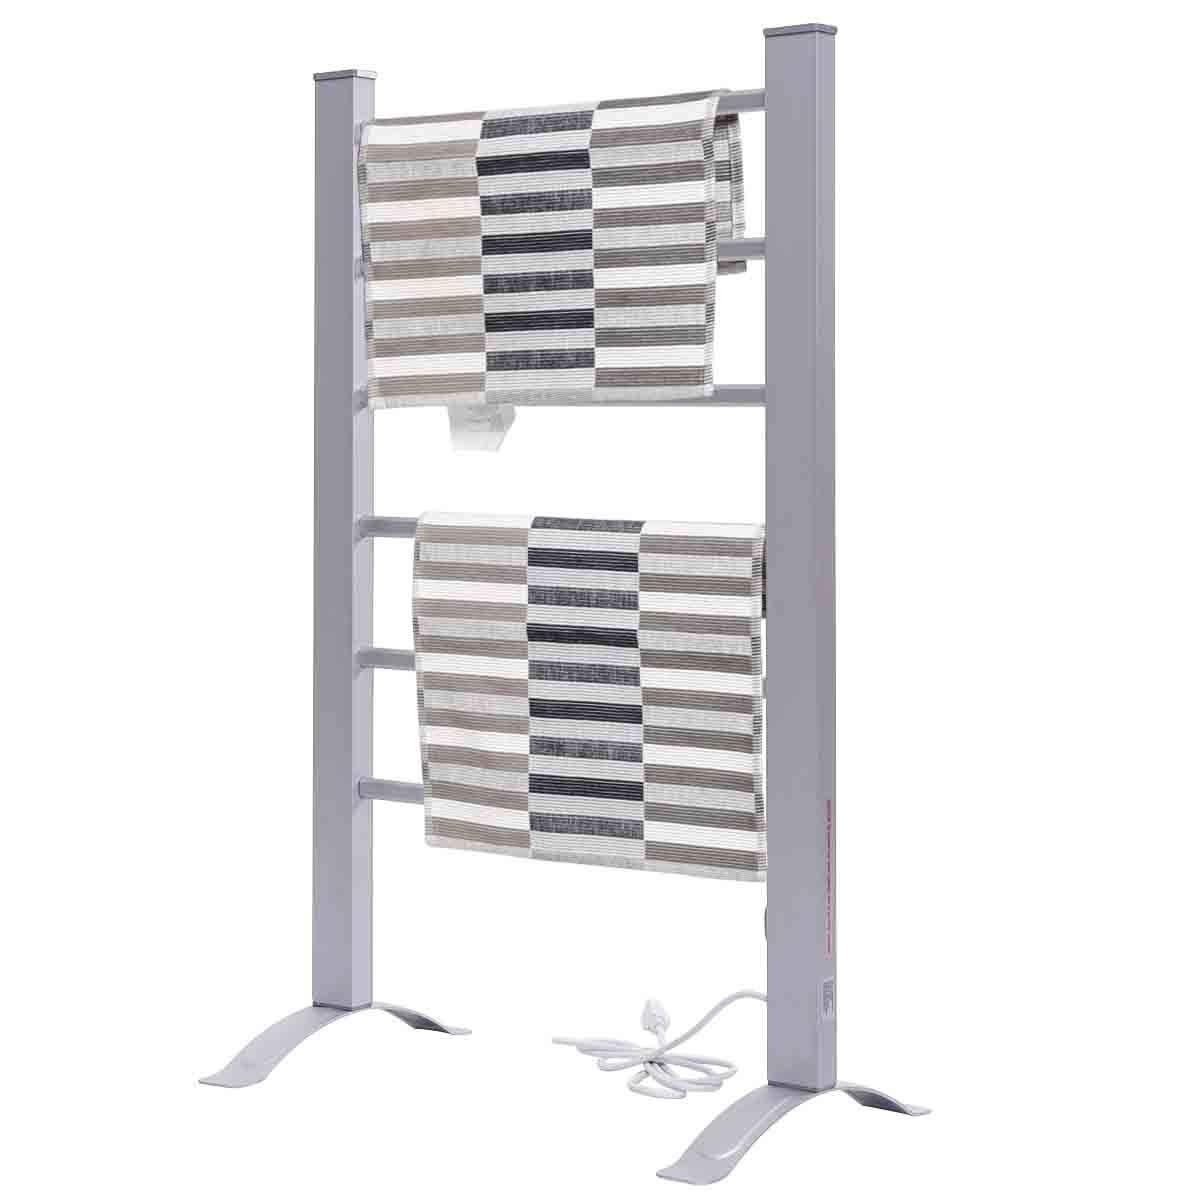 Safeplus Aluinum Electric Towel Warmer 6 Bar Bath Towel Heater Freestanding or Wall Mountable